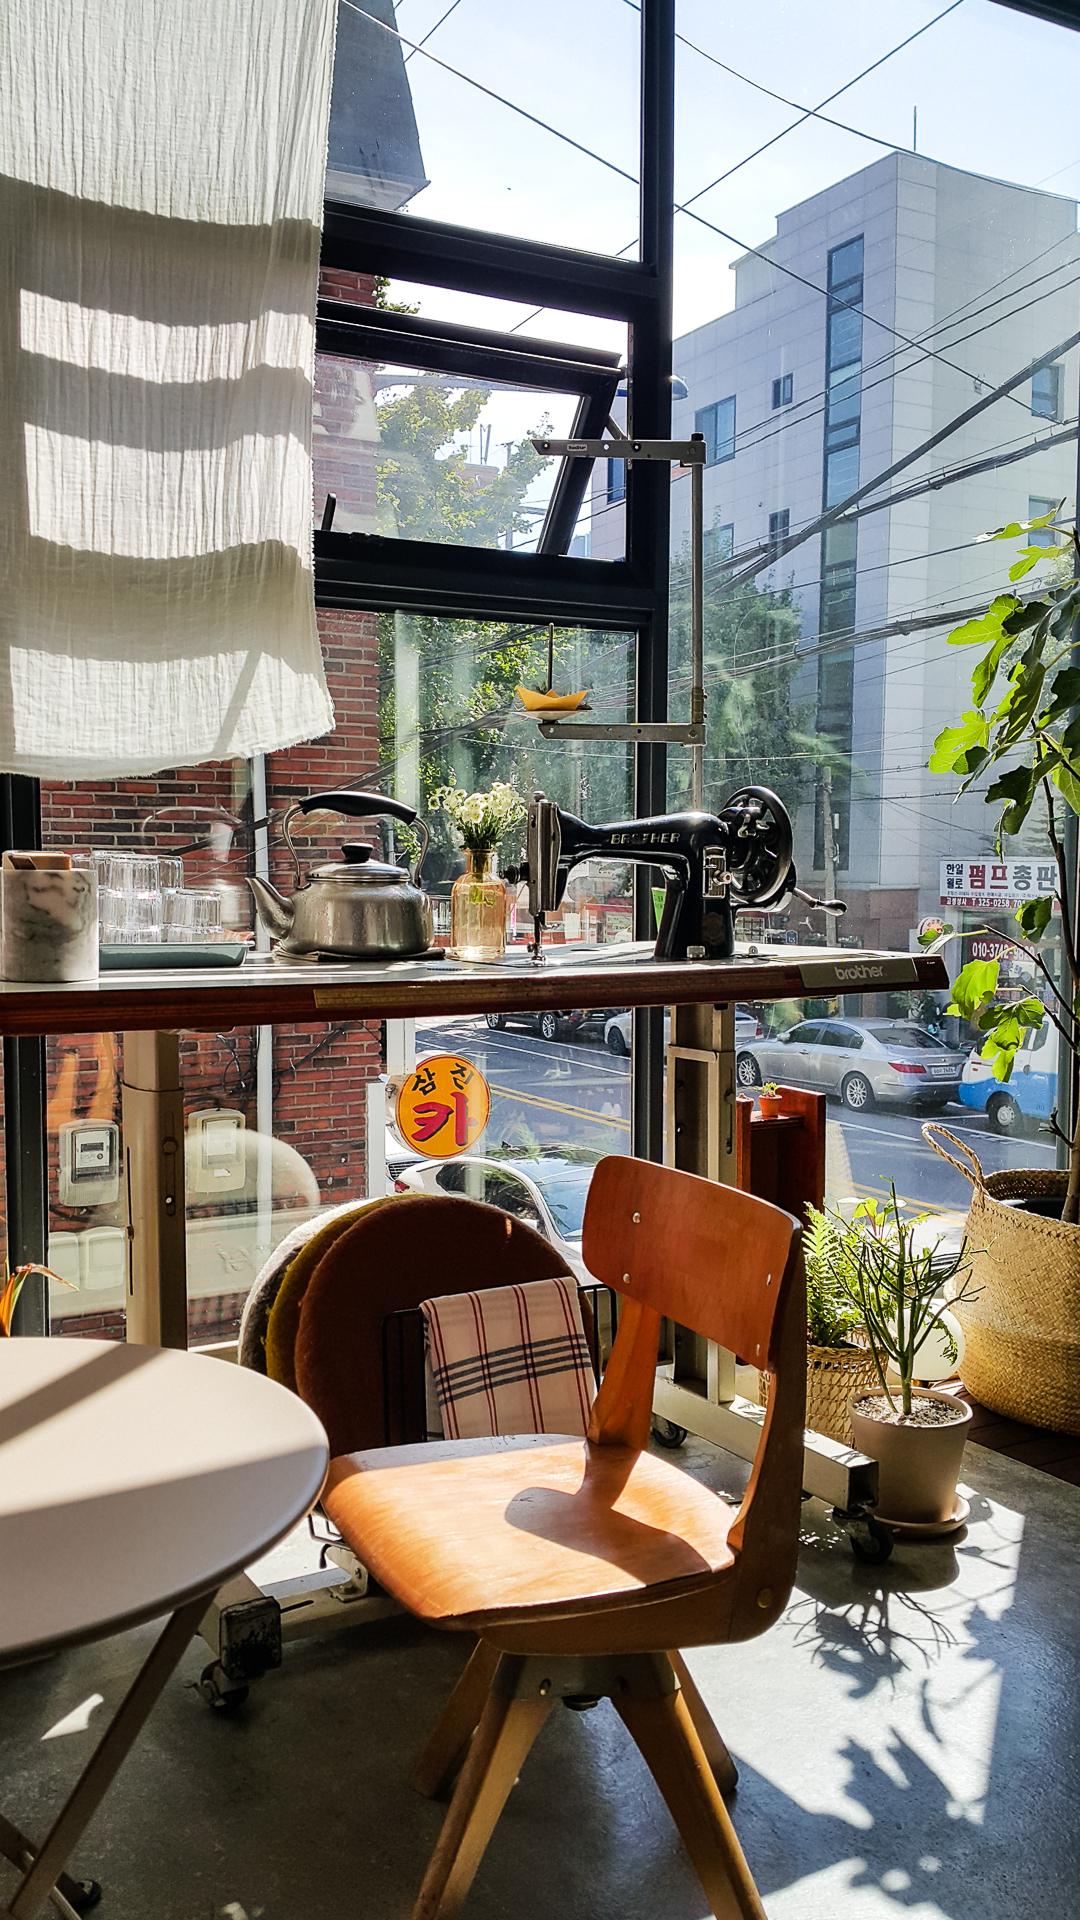 Seoul Cafés | Mangwon | Hungo Ringo Bread